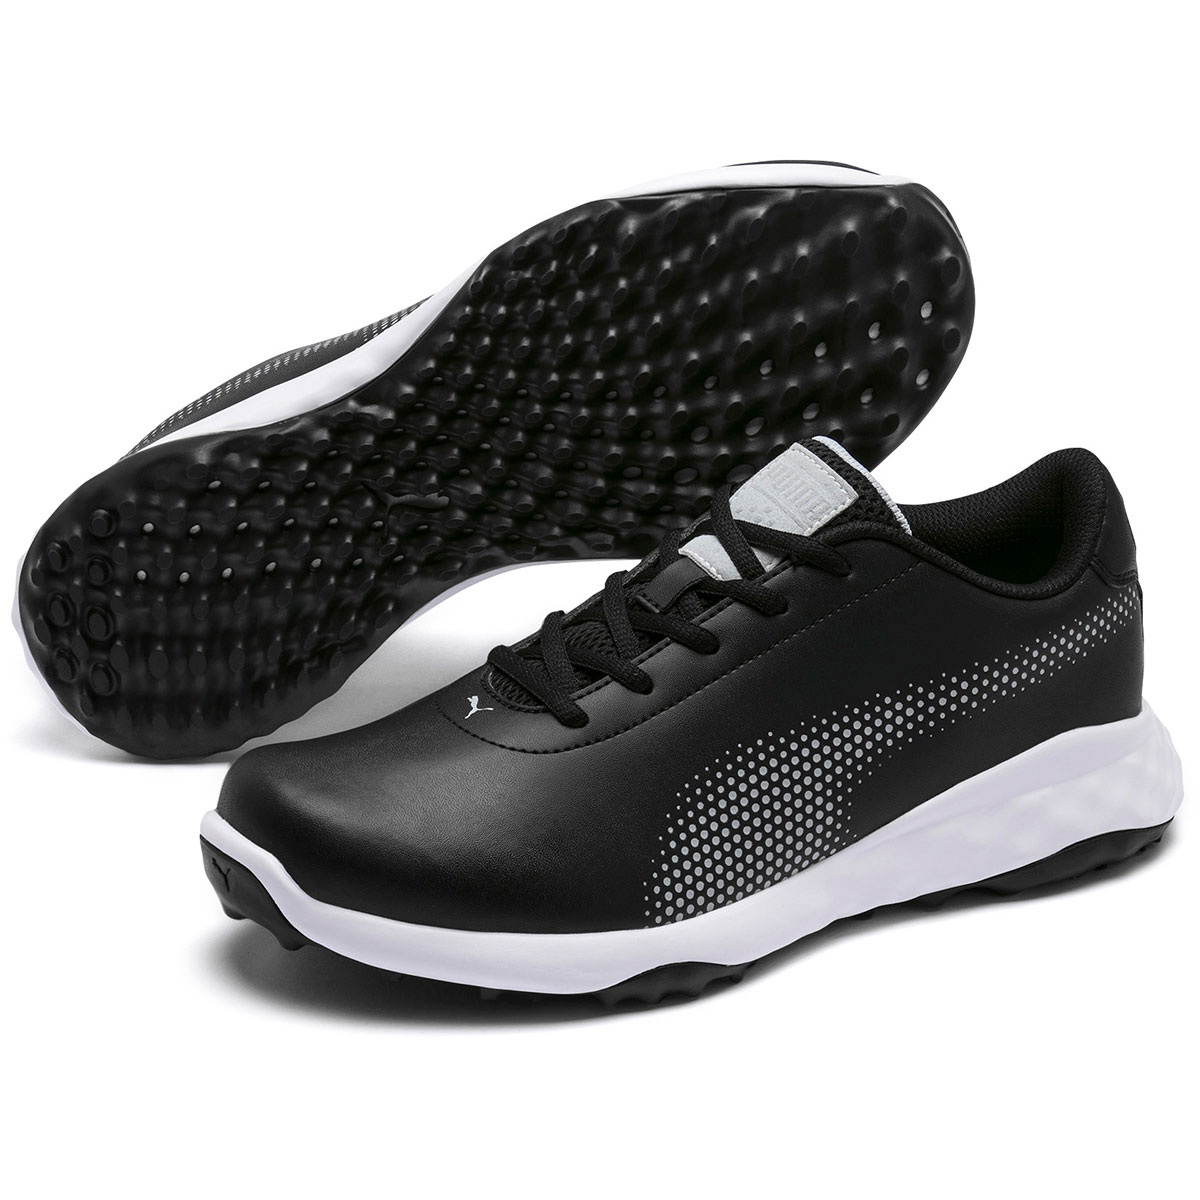 PUMA Golf Grip Fusion Tech Shoes